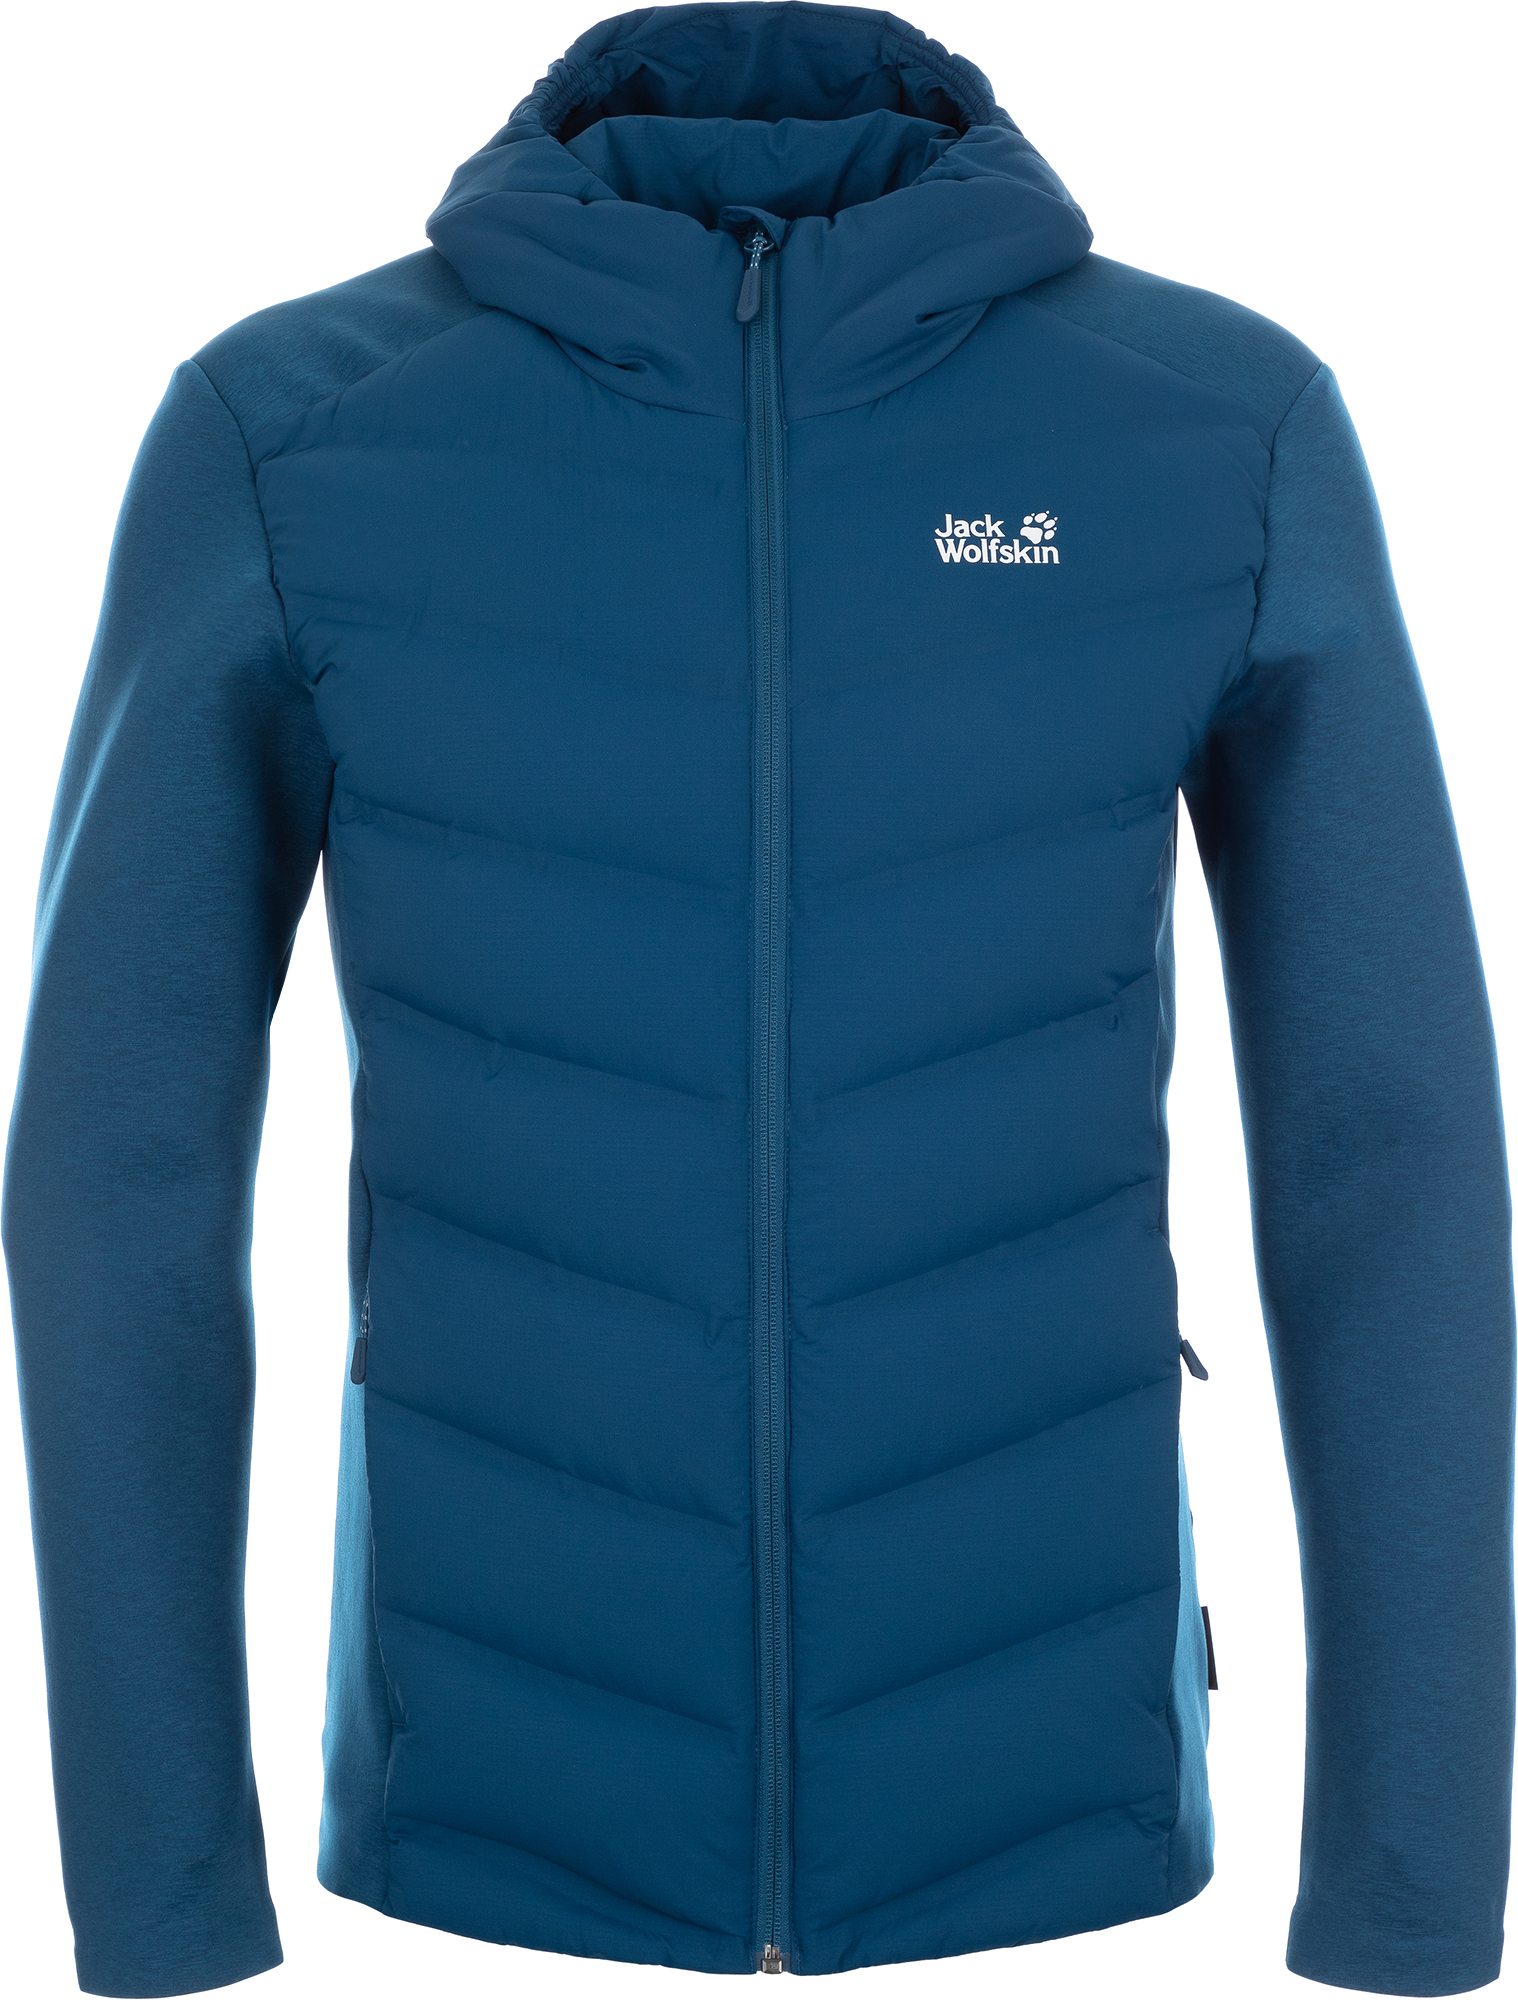 Jack Wolfskin Куртка пуховая мужская JACK WOLFSKIN Tasman, размер 54-56 цена